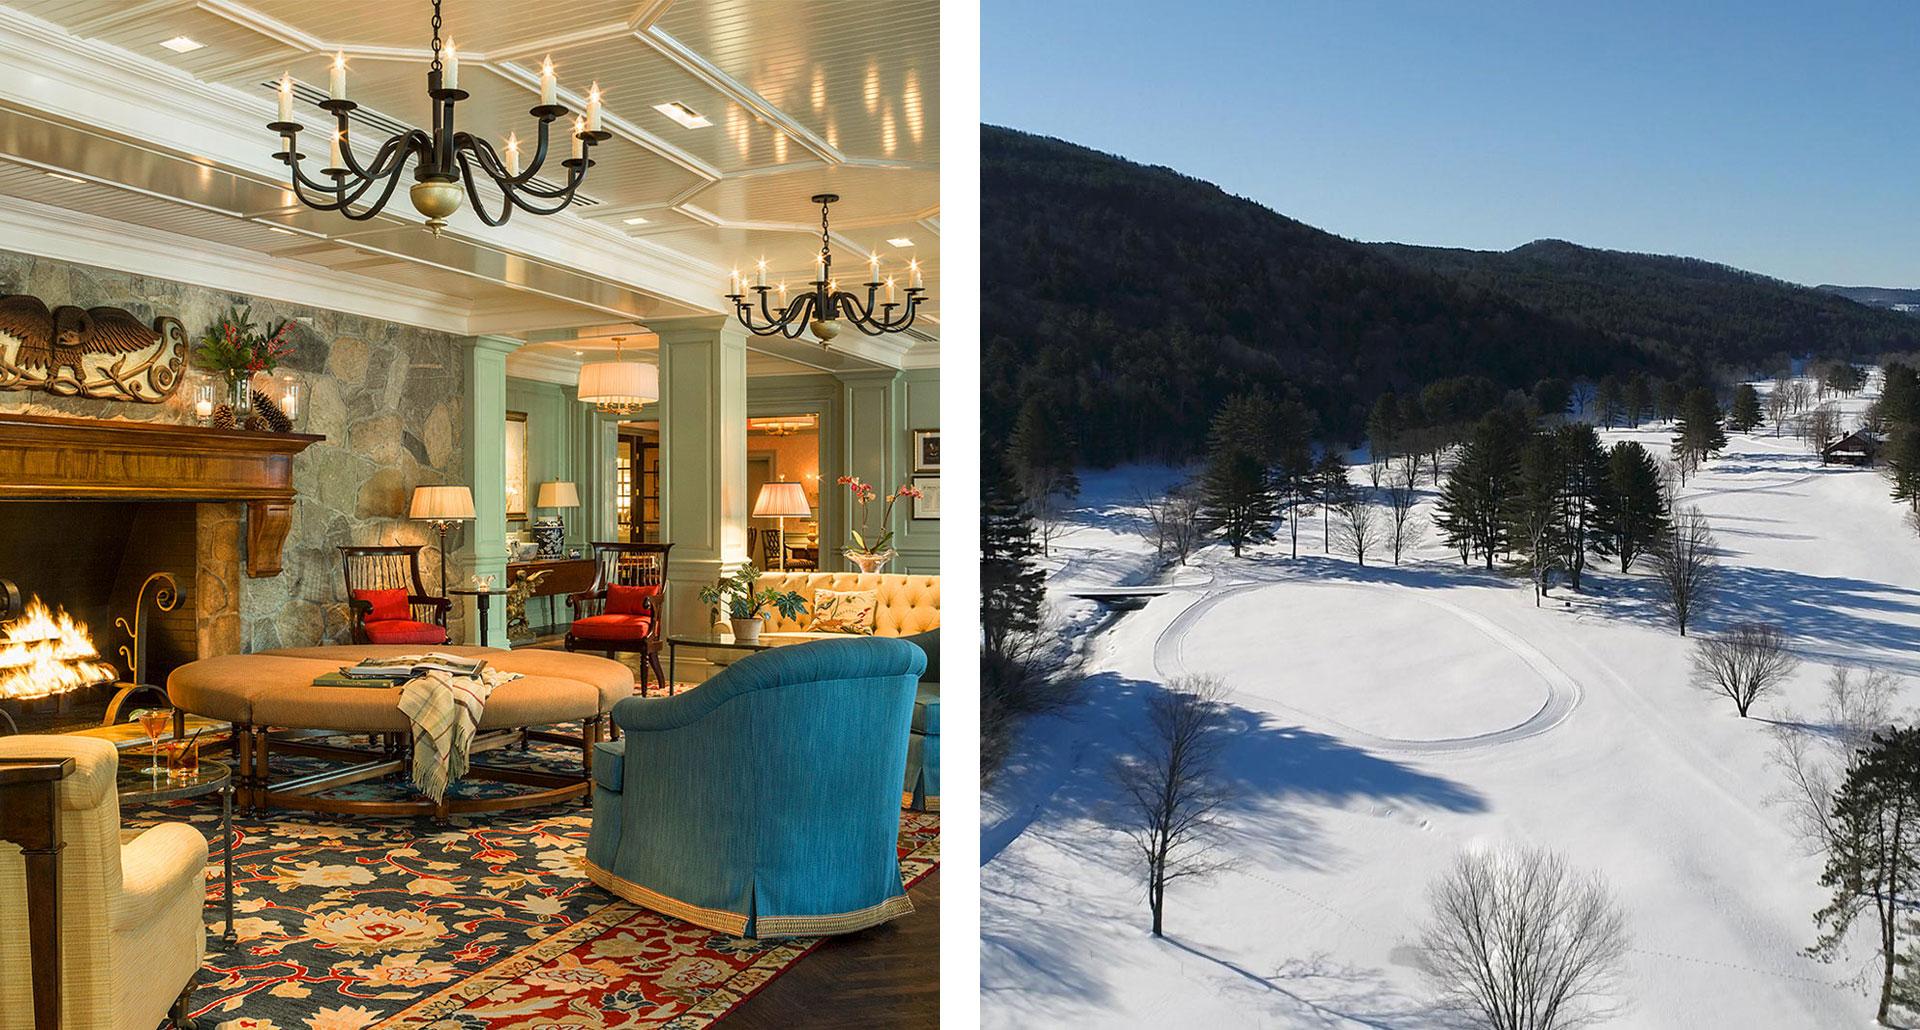 The Woodstock Inn & Resort - boutique hotel in Vermont